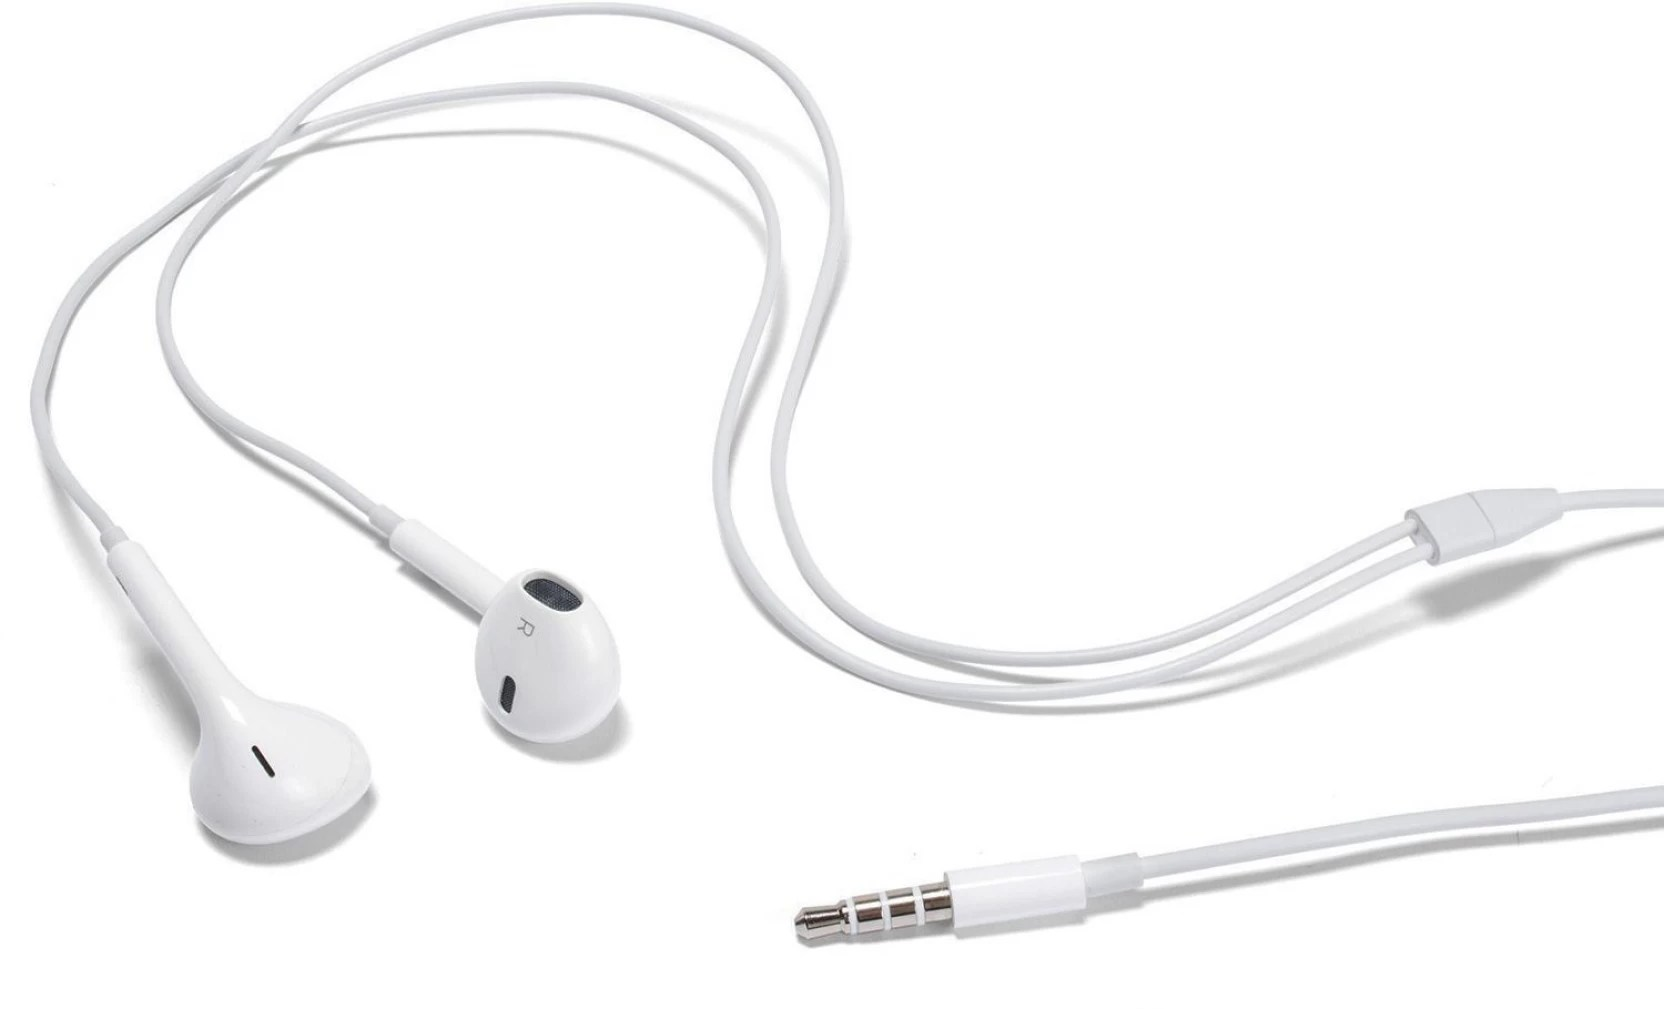 medium resolution of digitalmart premium quality high selling earphone for apple iphone 5 5s 5c 6 6s 6plus 6splus 7 7plus ipad ipod wired headset with mic headphone white